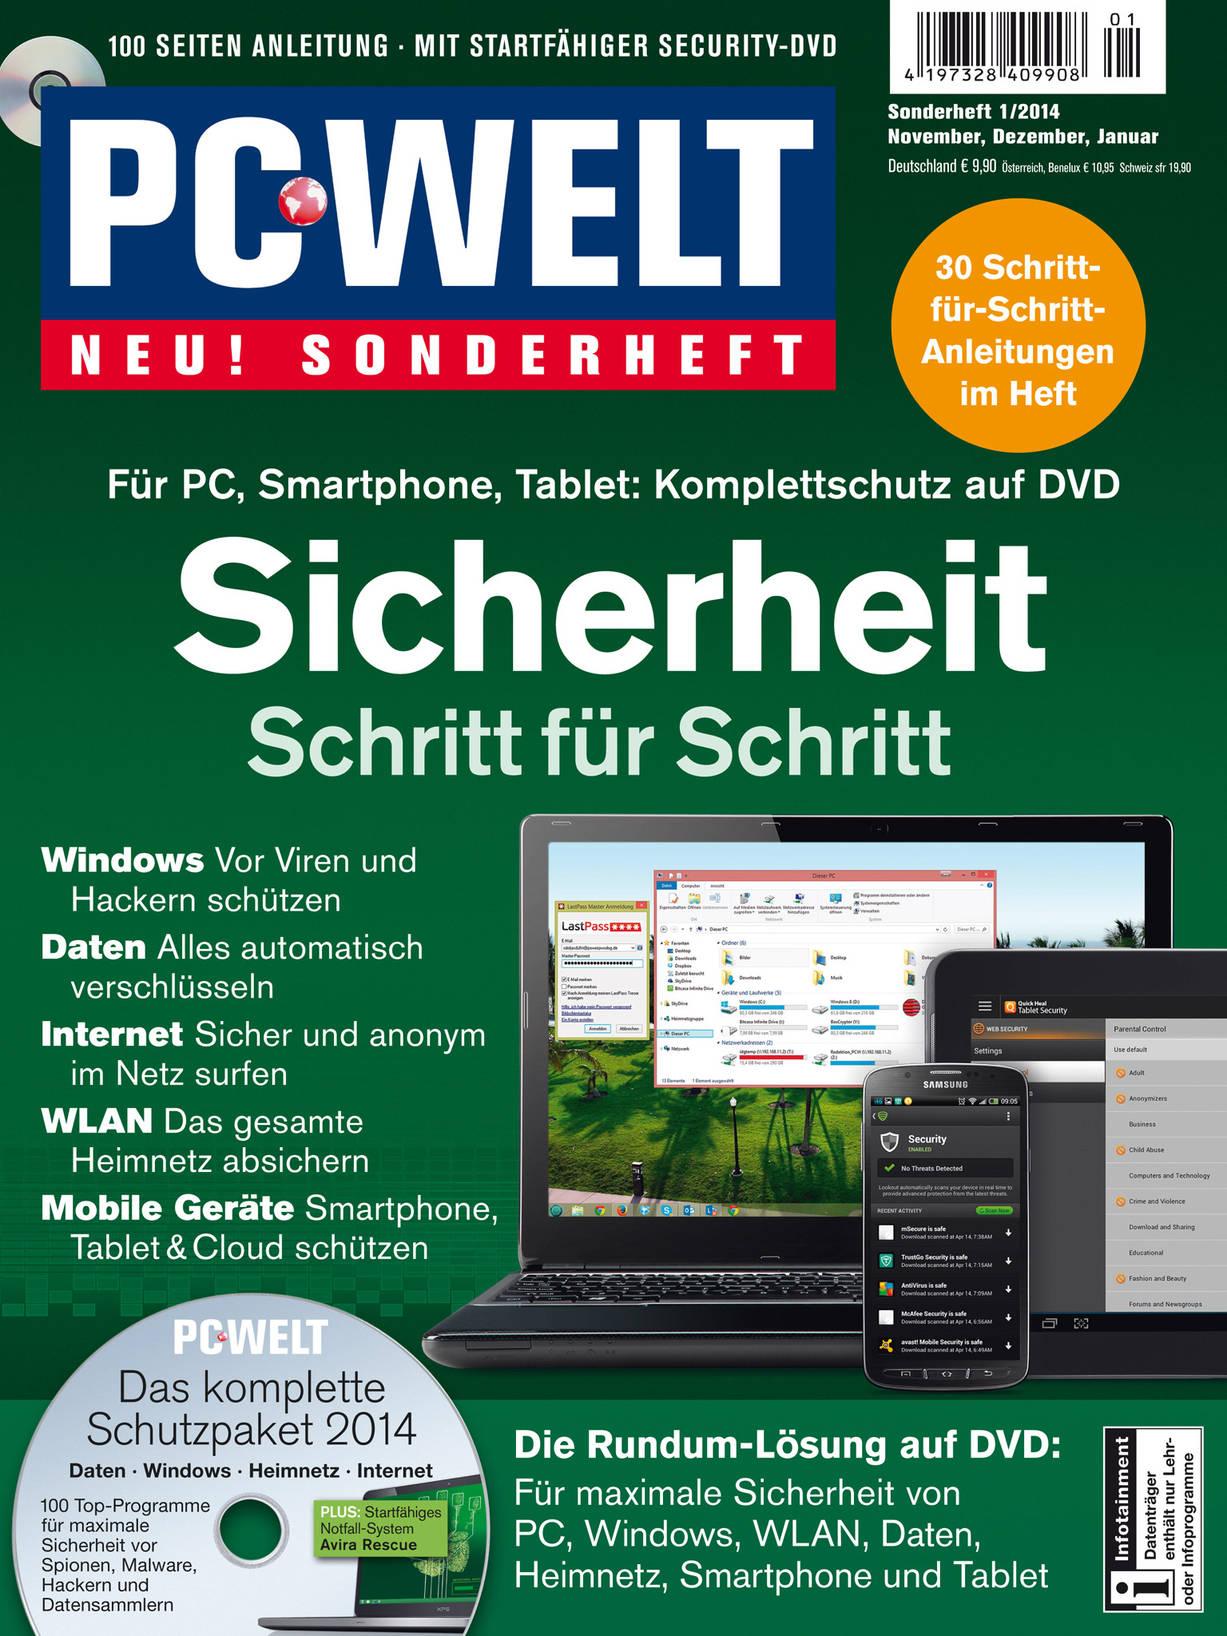 Pc-Welt Kundenservice